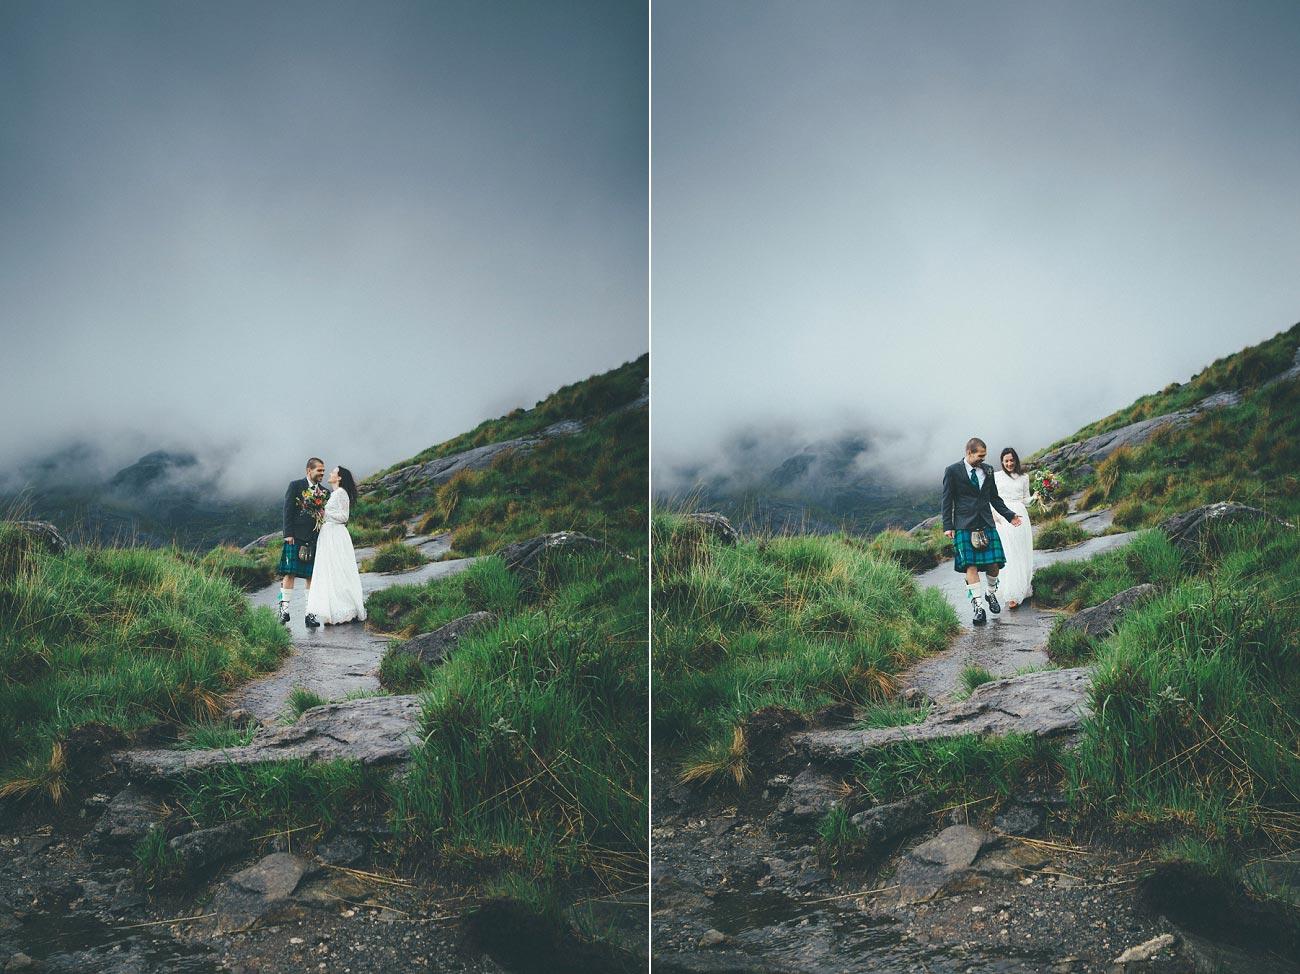 isle of skye wedding photography elopement loch coruisk humanist outdoor weddings scottish highlands 0043